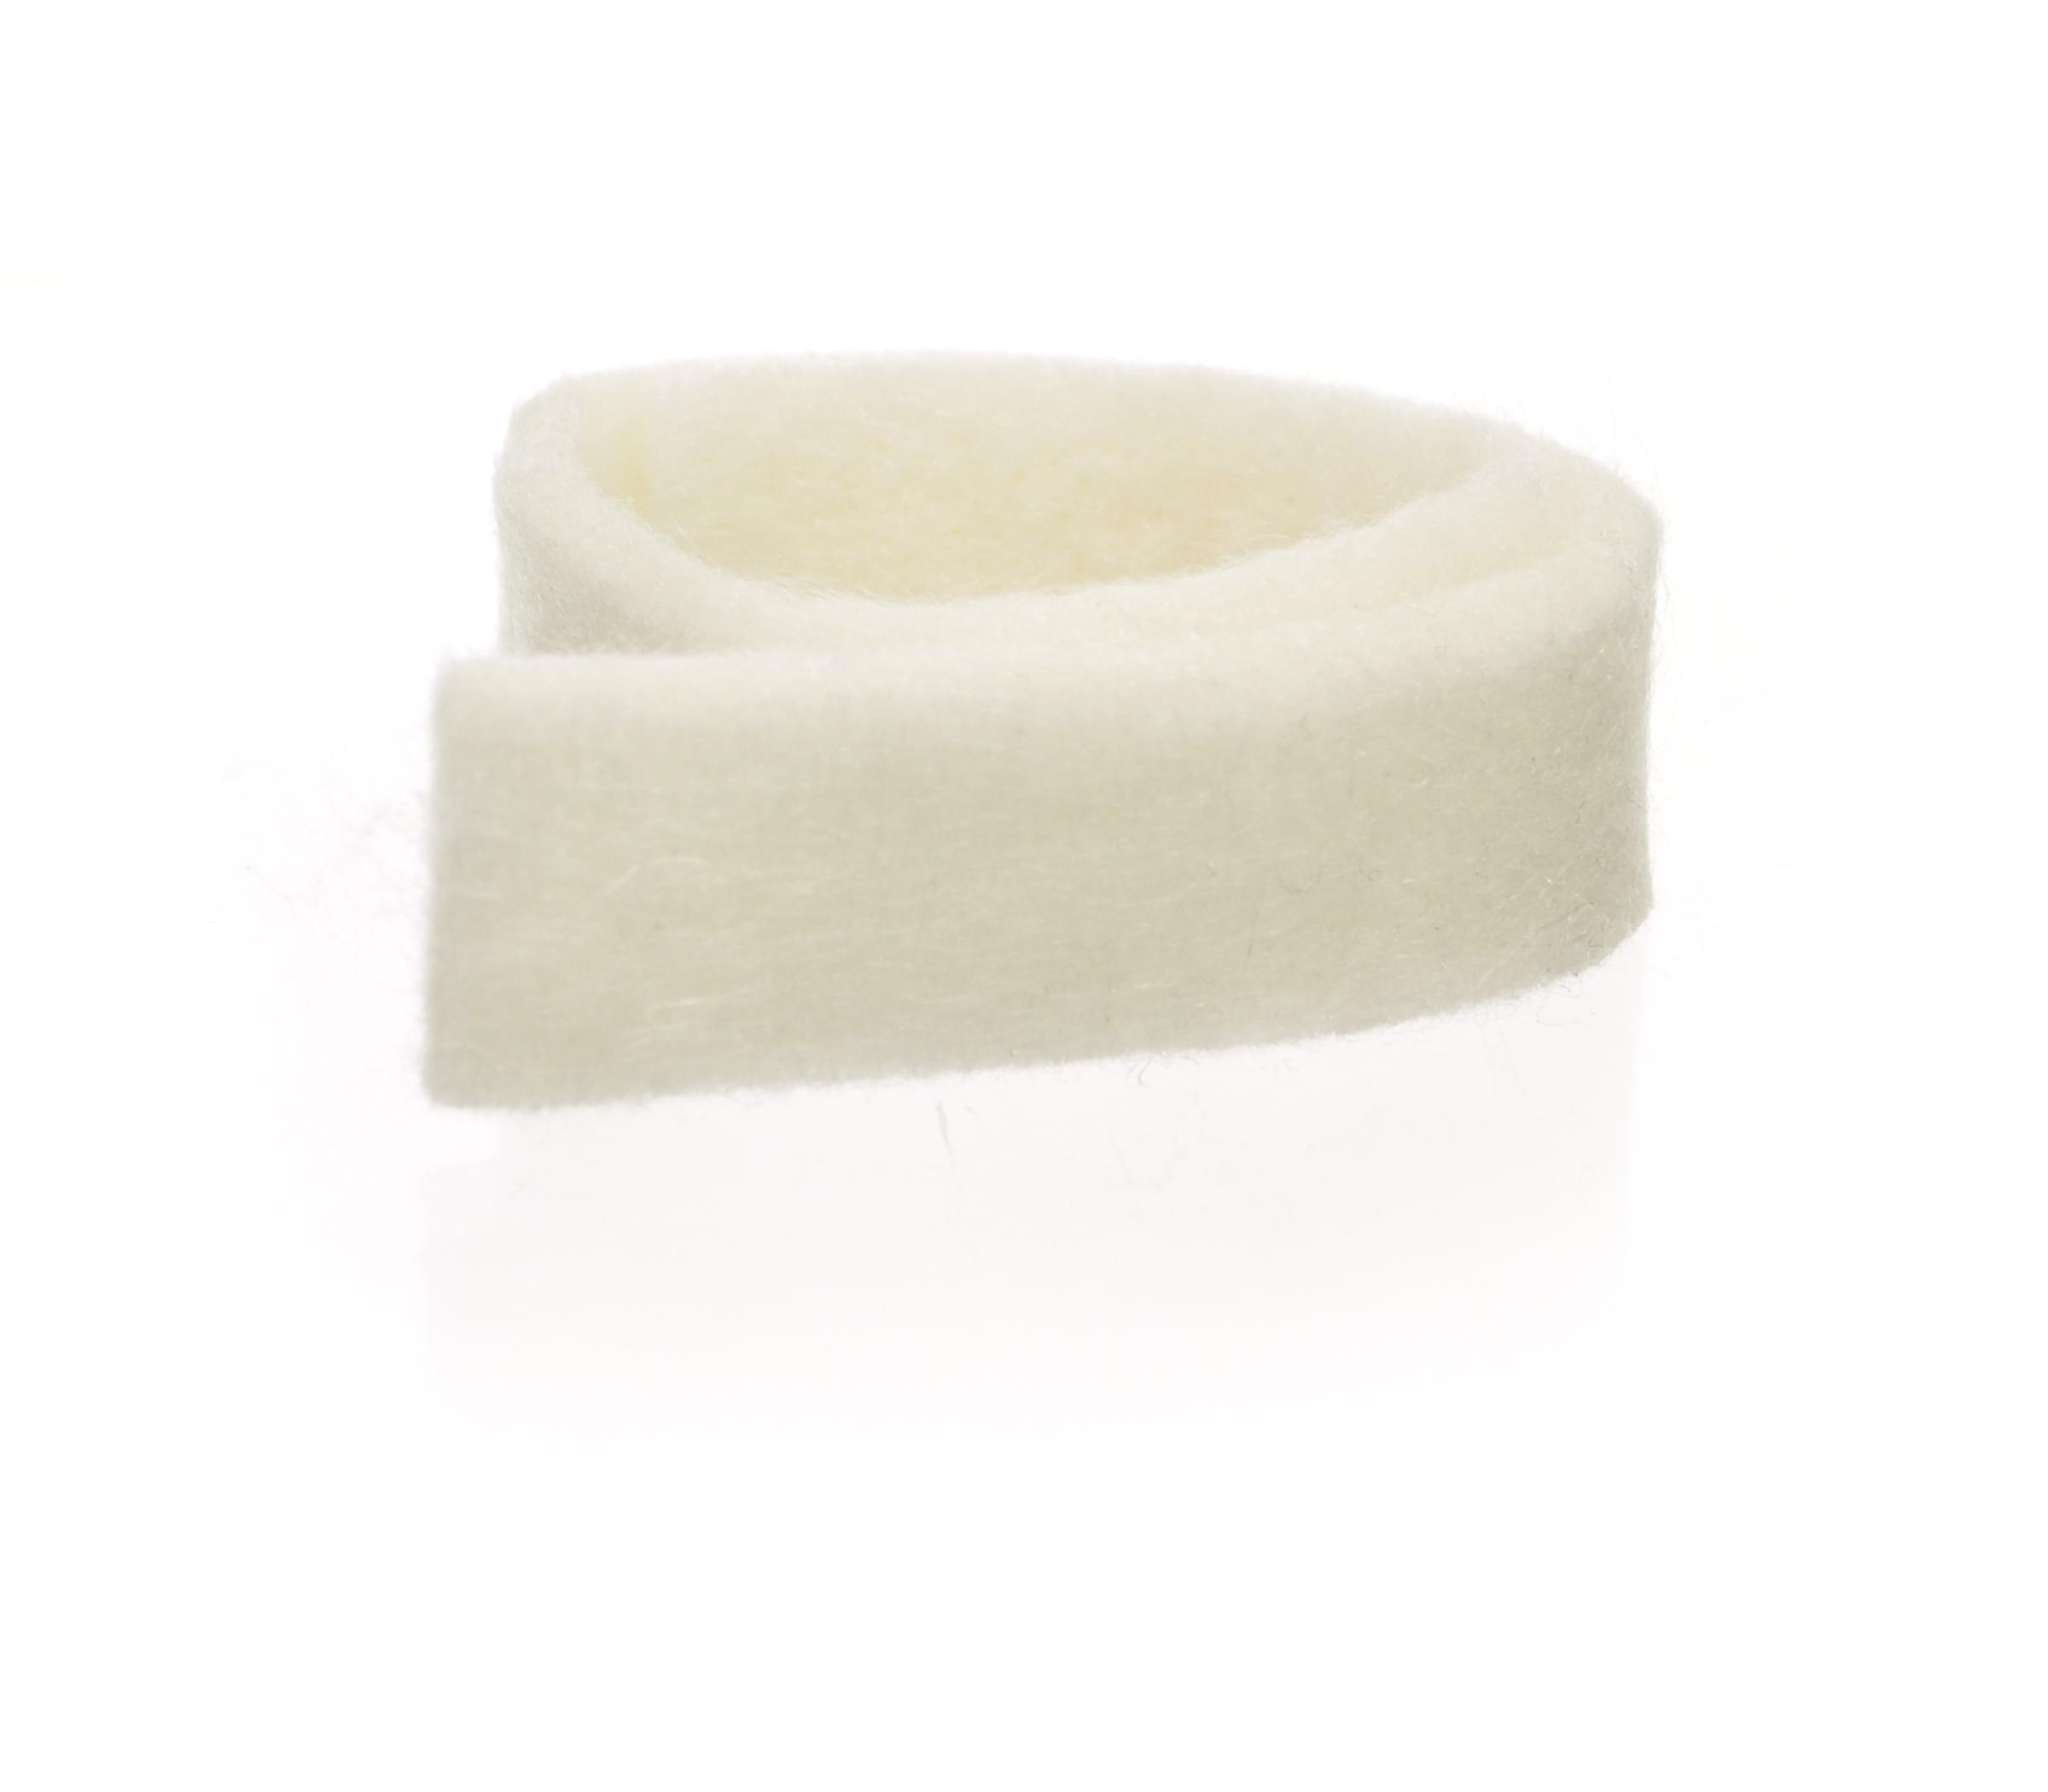 DermaGinate Calcium Alginate Rope Dressing, 12 Inch Length, Sterile, Box of 5